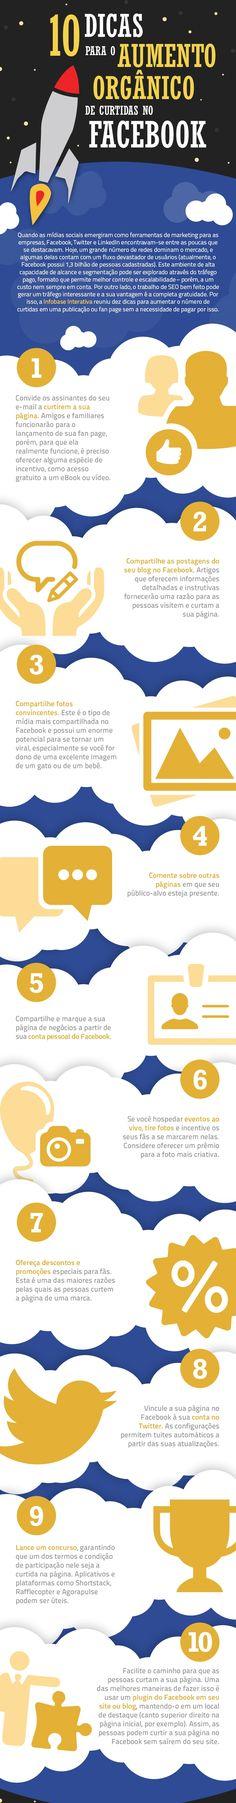 Alcance orgânico no #Facebook. #Infográfico #Marketing